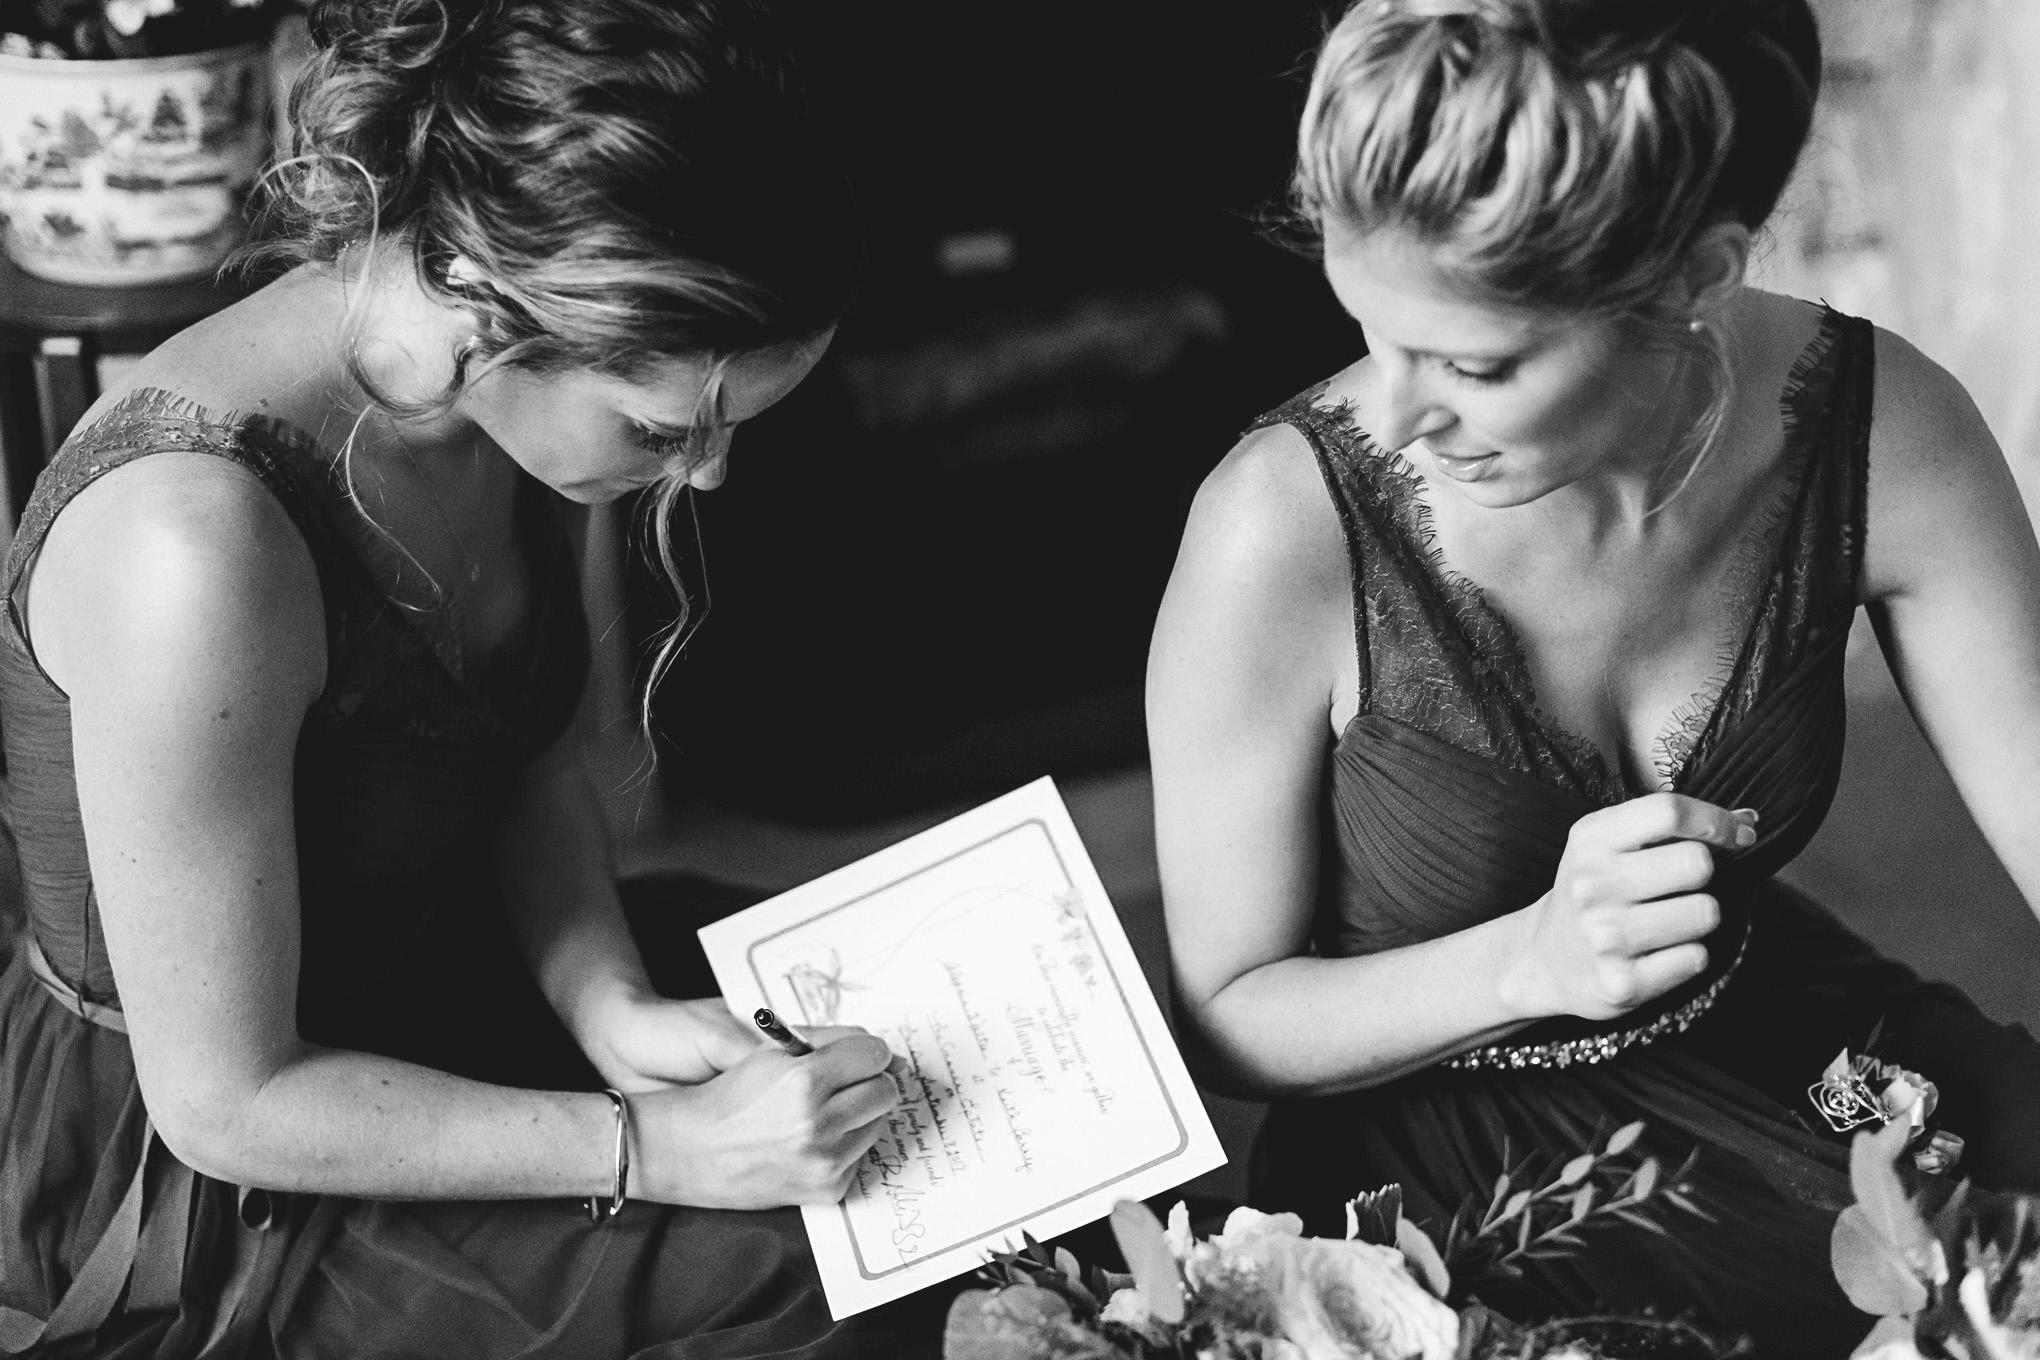 Lena_Mirisola_2017_Weddings_-028.jpg